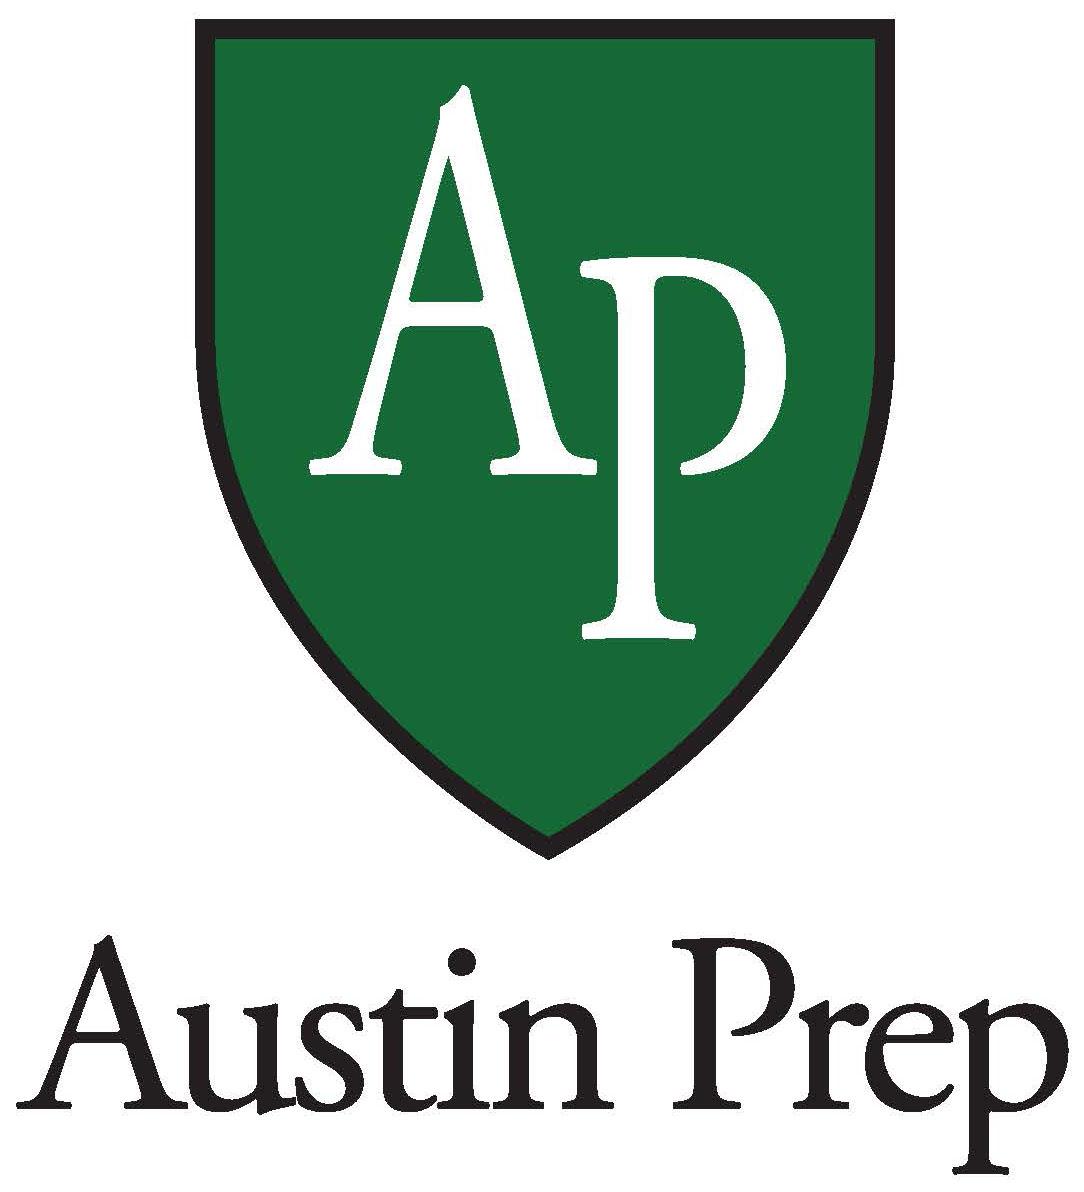 Austin Prep logo